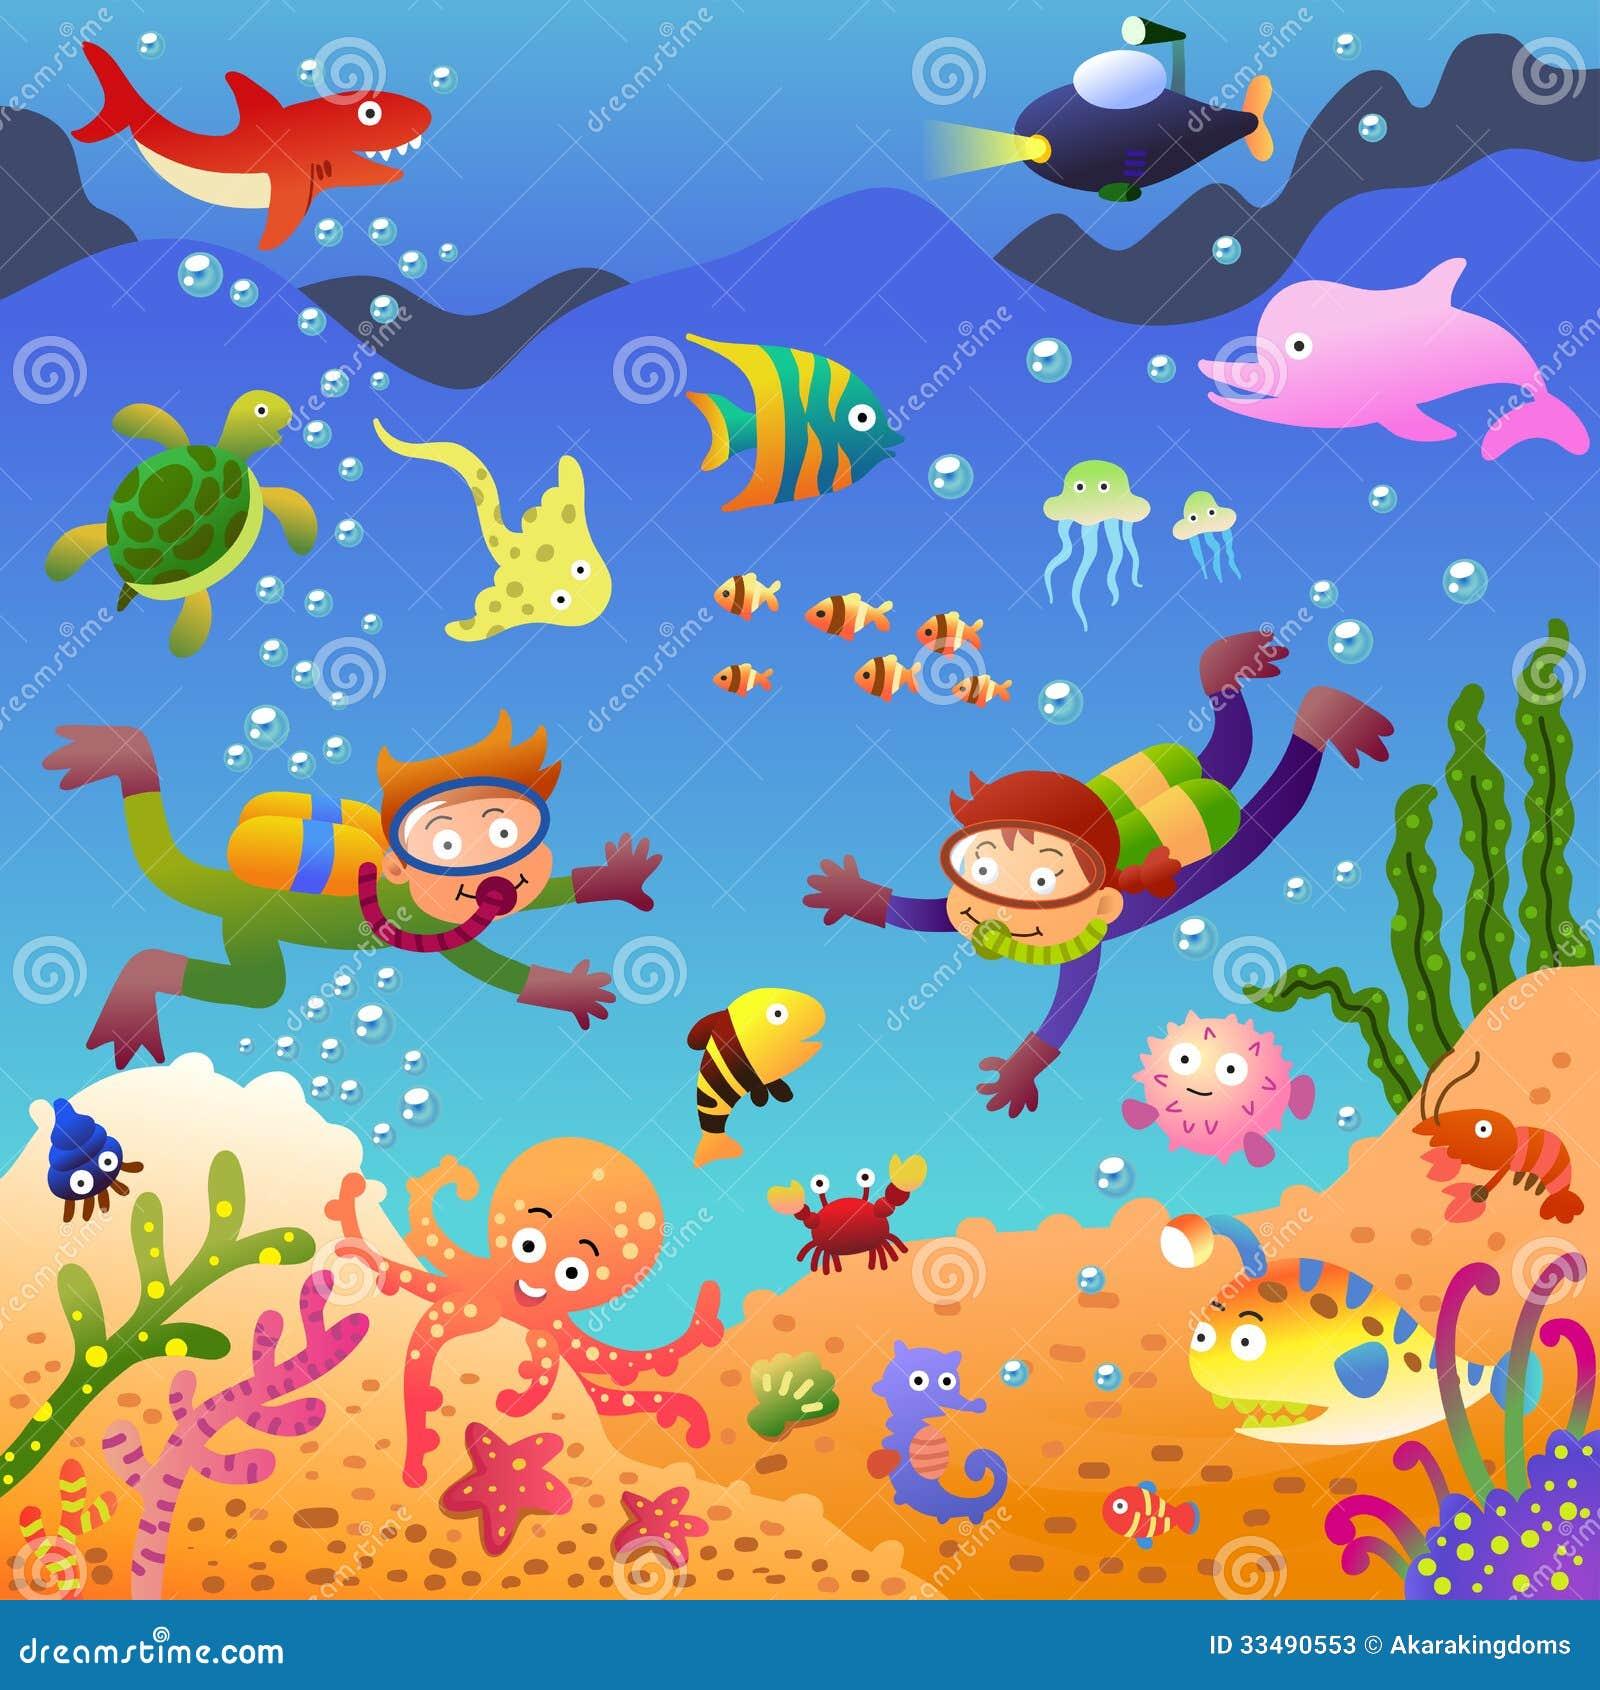 Draw Floor Plans Free Under The Sea Stock Photos Image 33490553